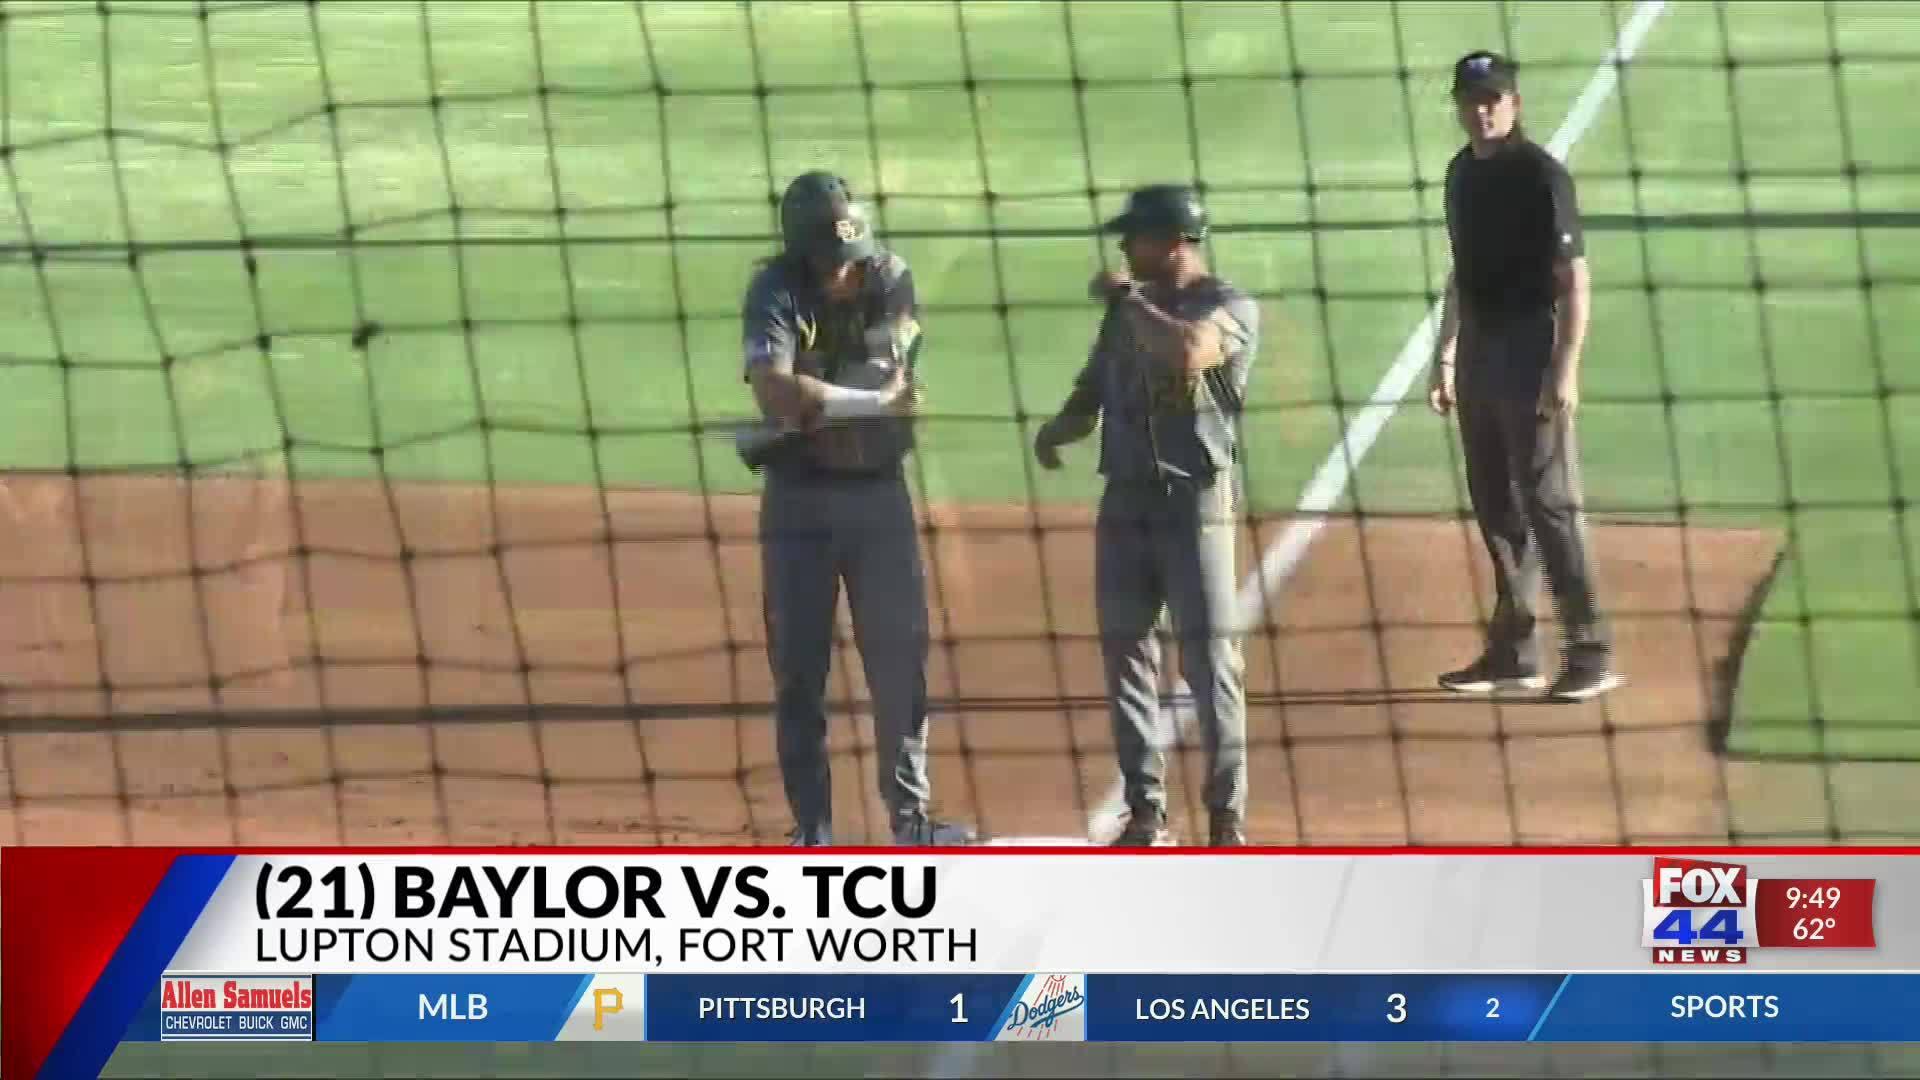 Baylor_Baseball___TCU_6_20190427025452